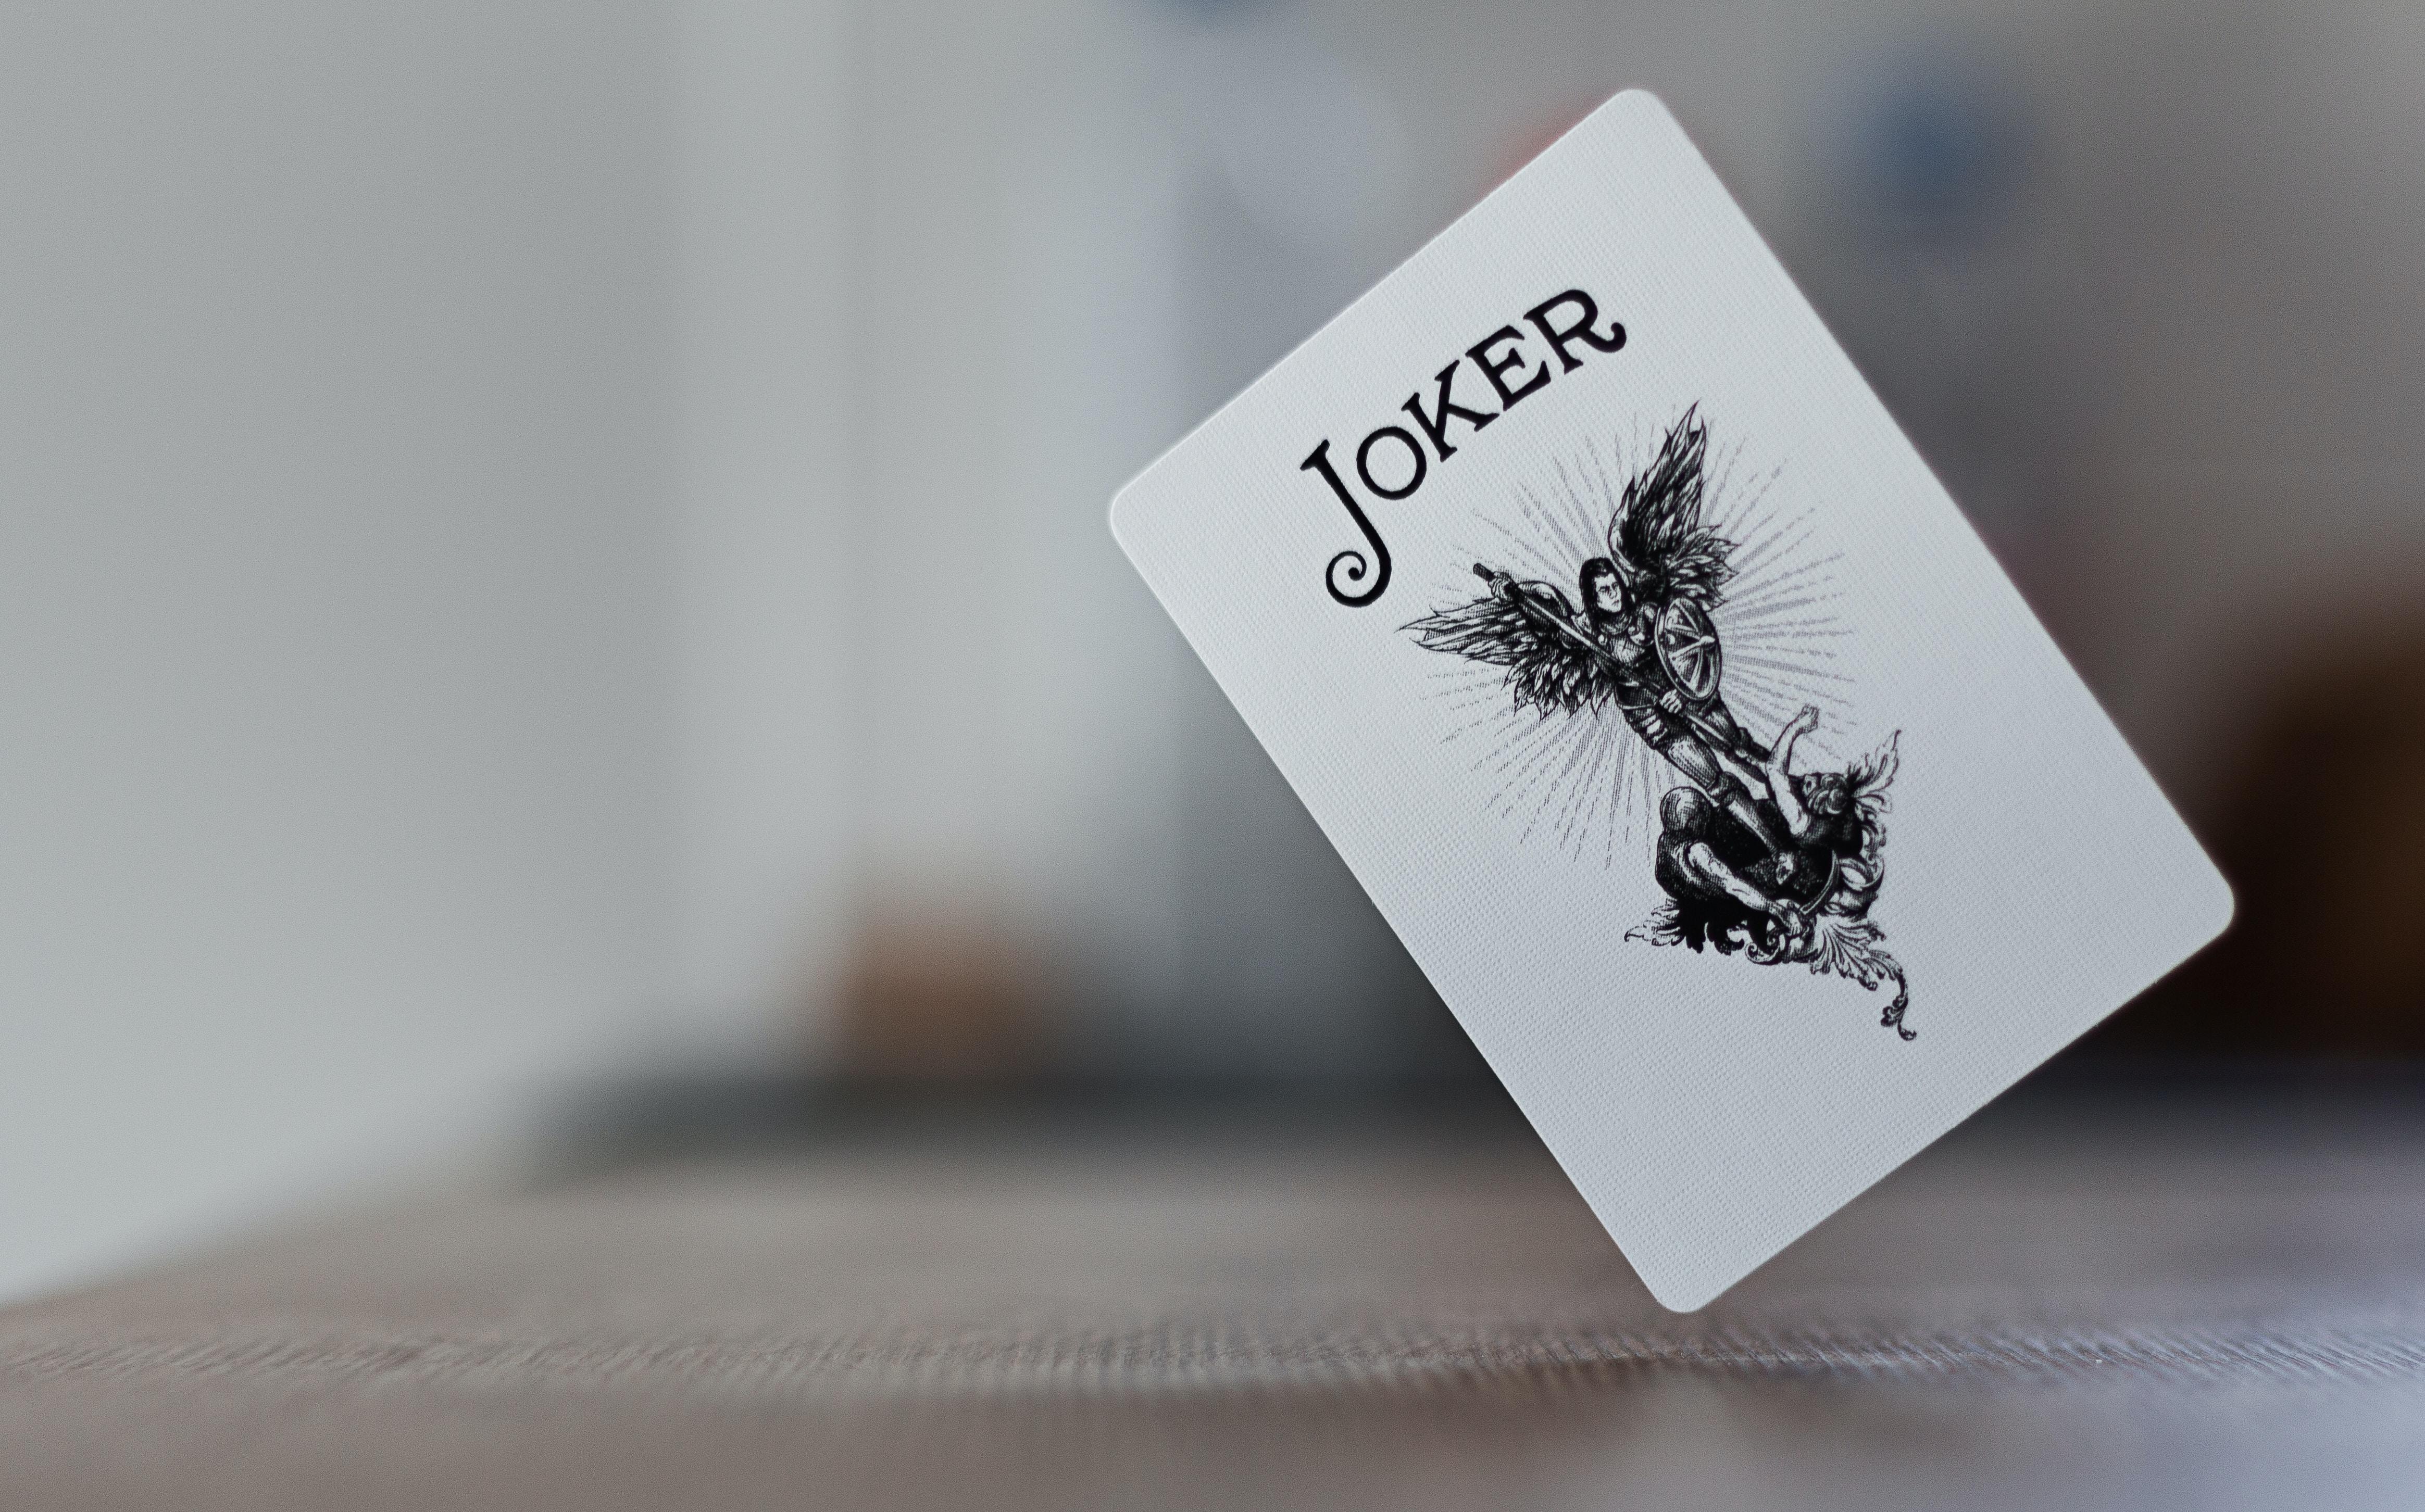 close-up photography of Joker card